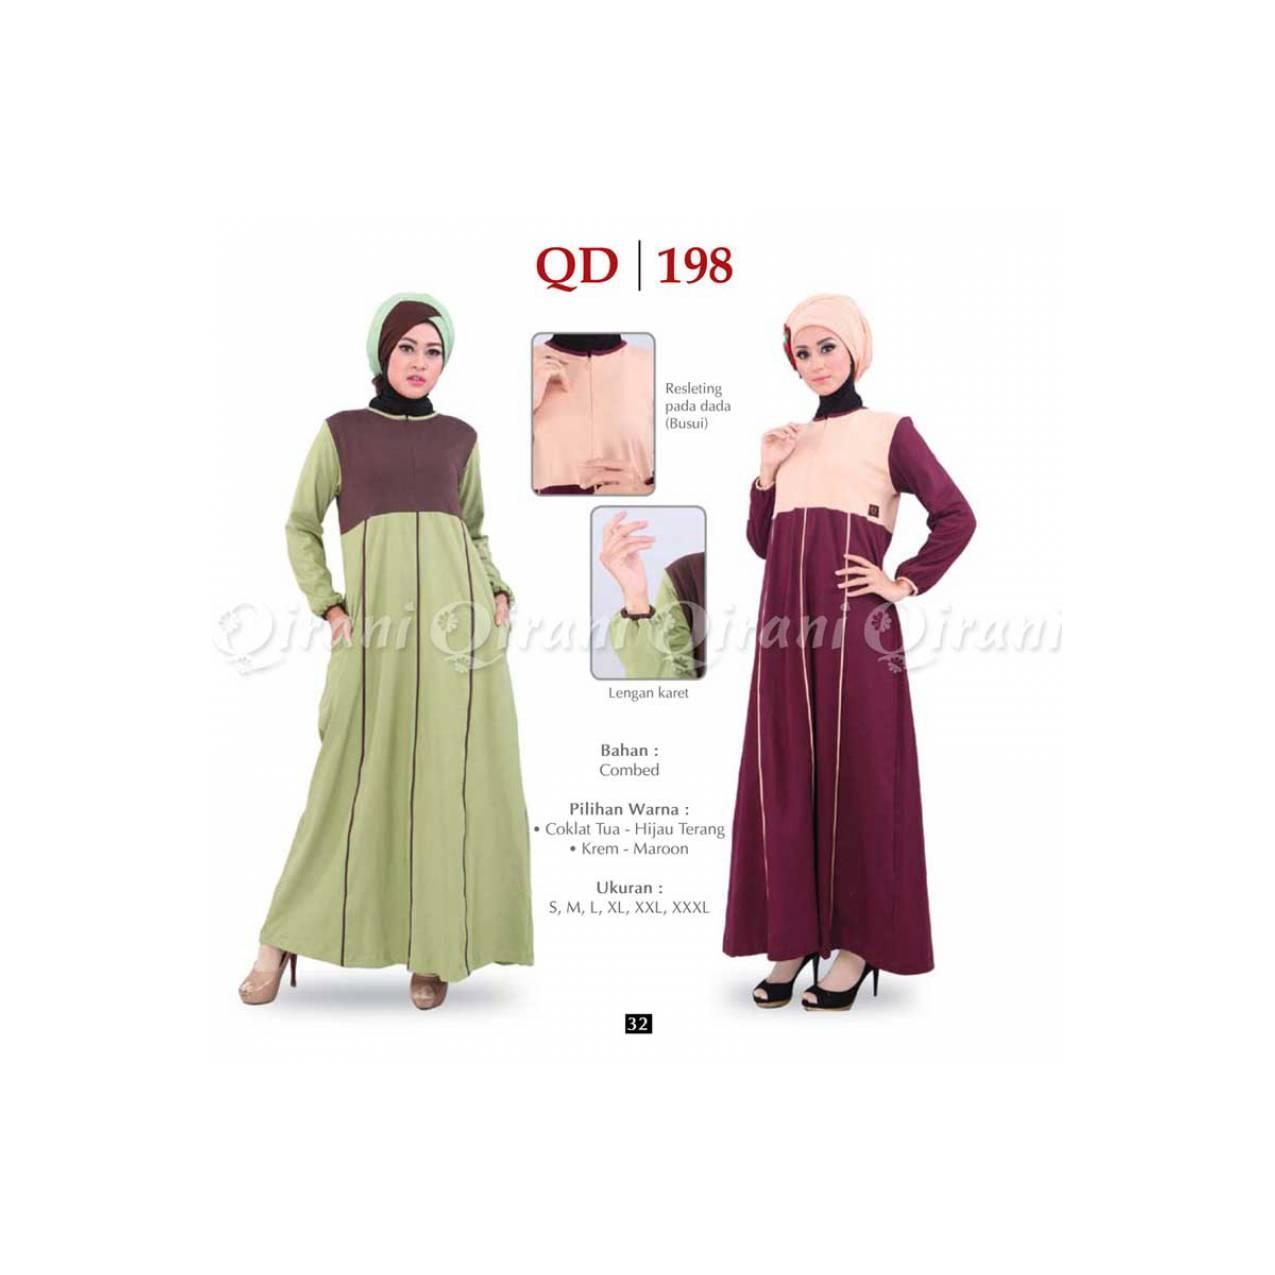 Baju Muslimah Gamis Murah Bahan Kaos QIRANI QD - 198